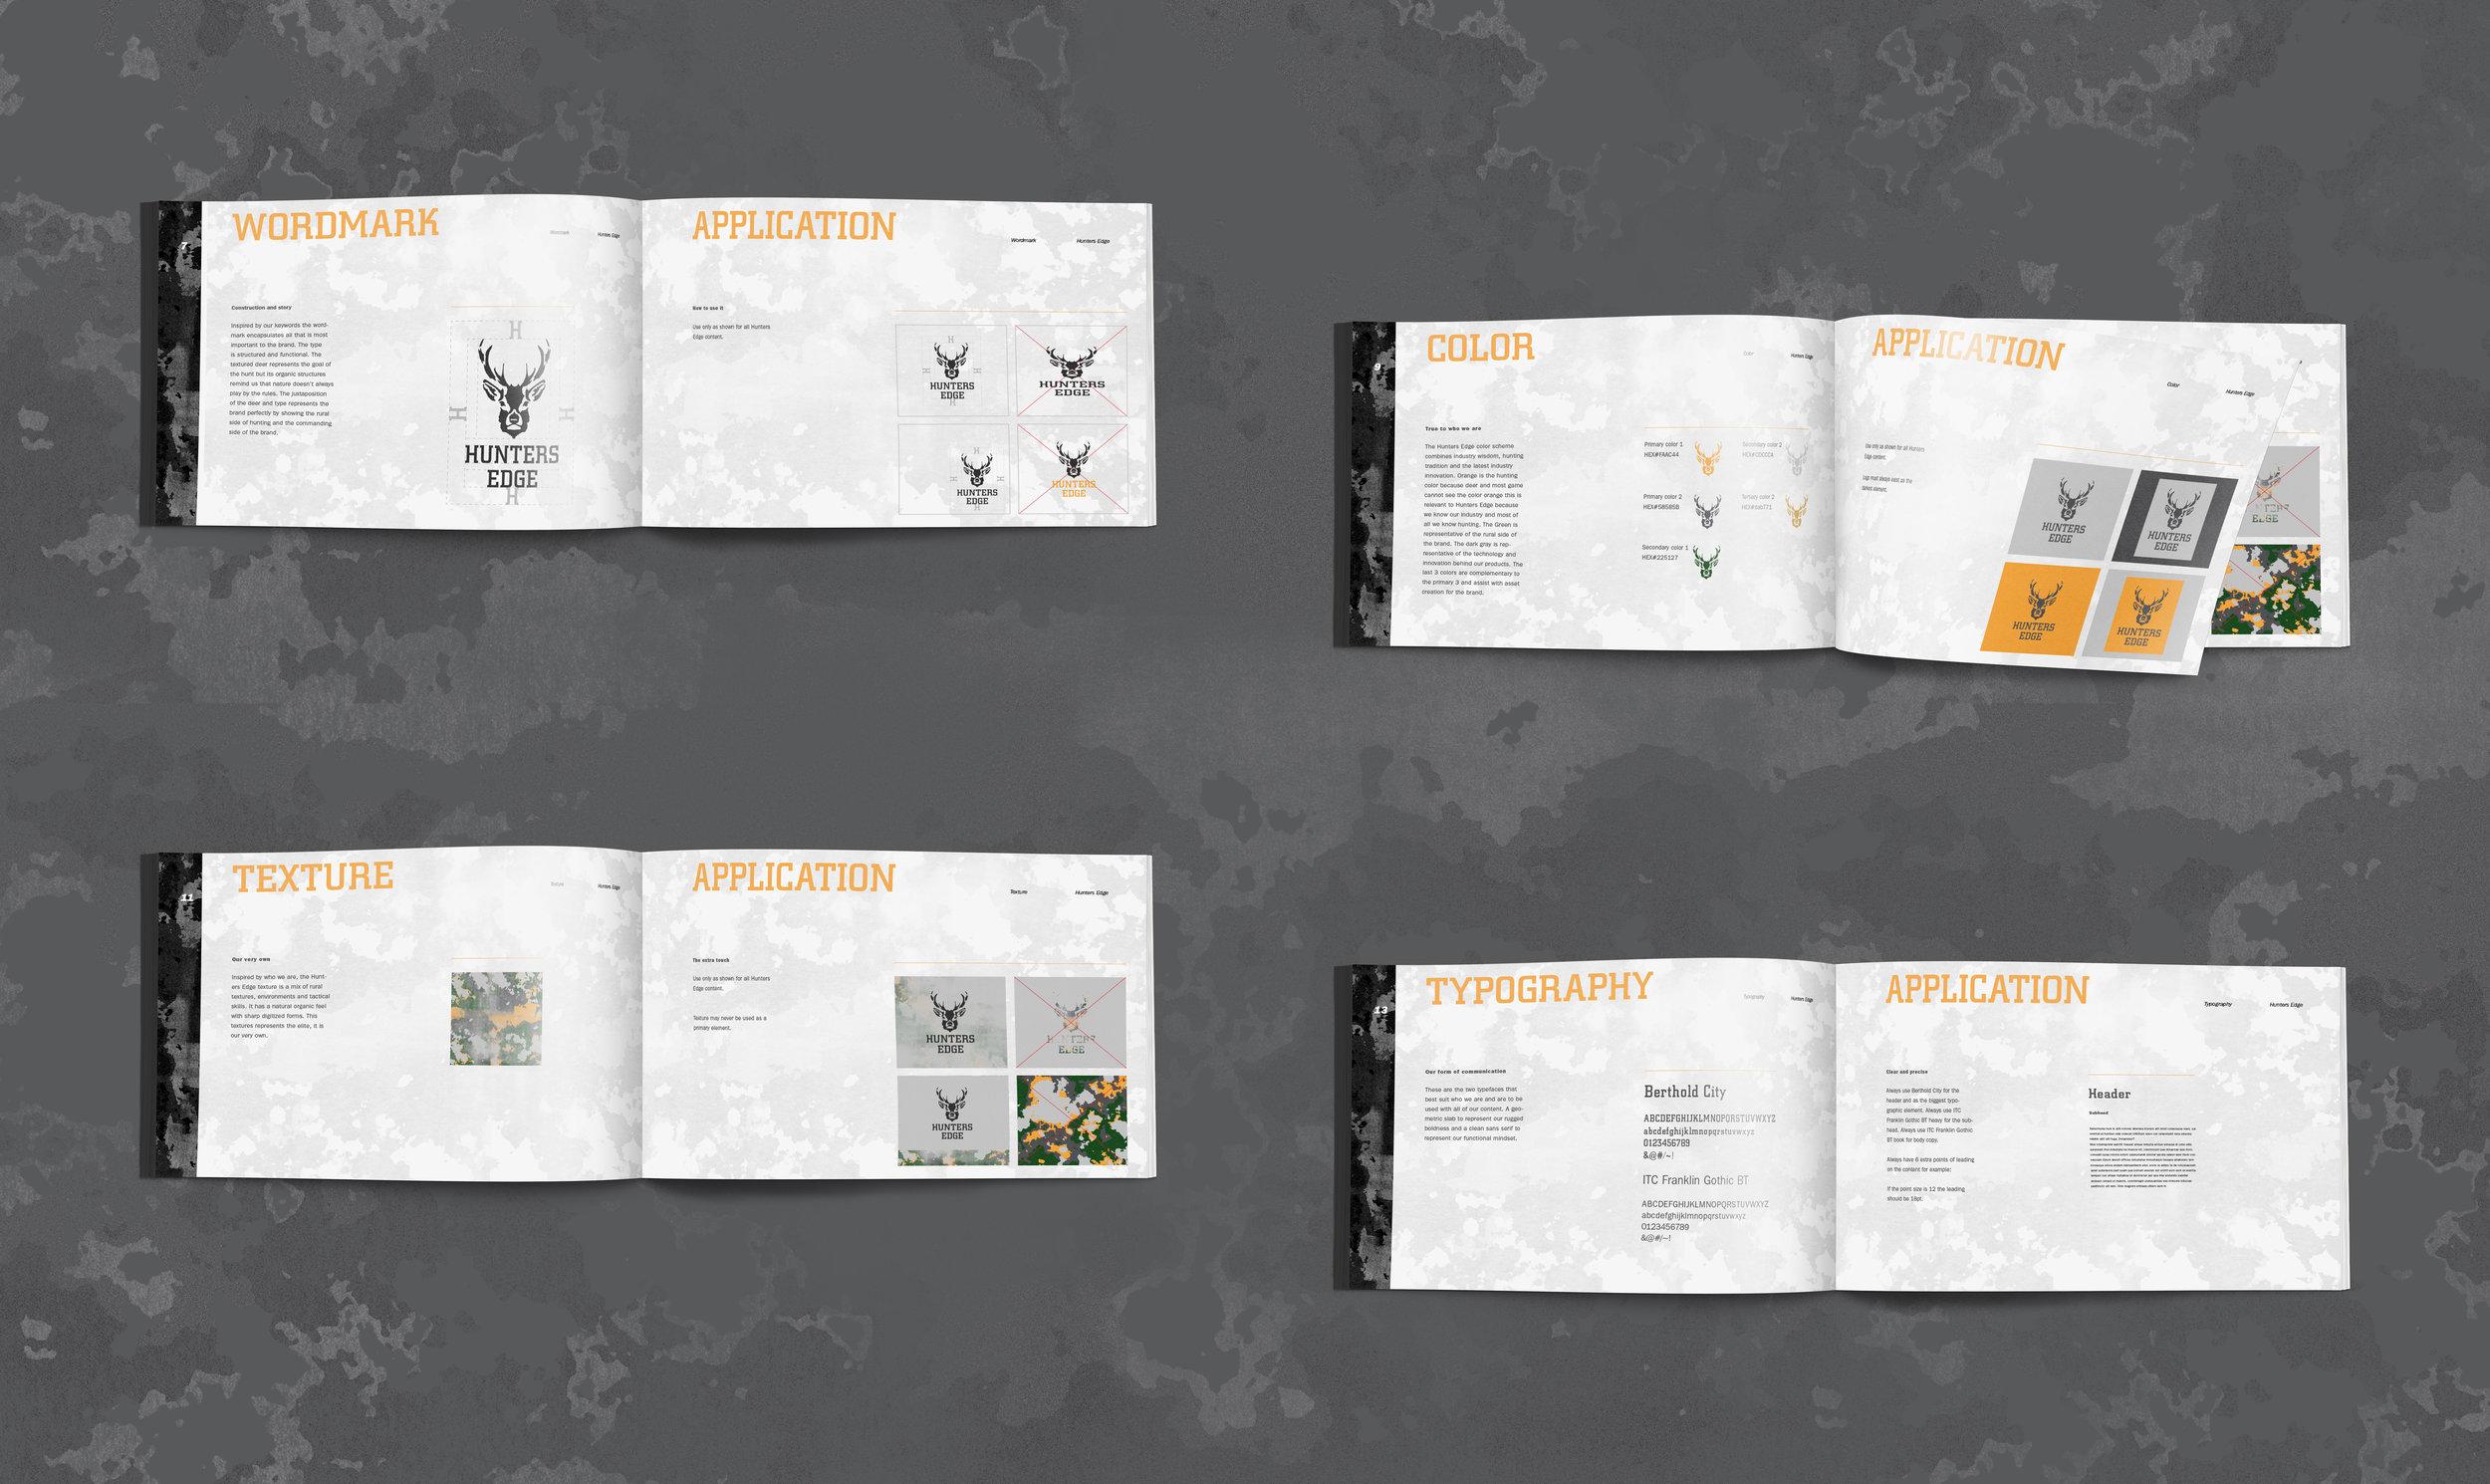 Brand_guides.jpg